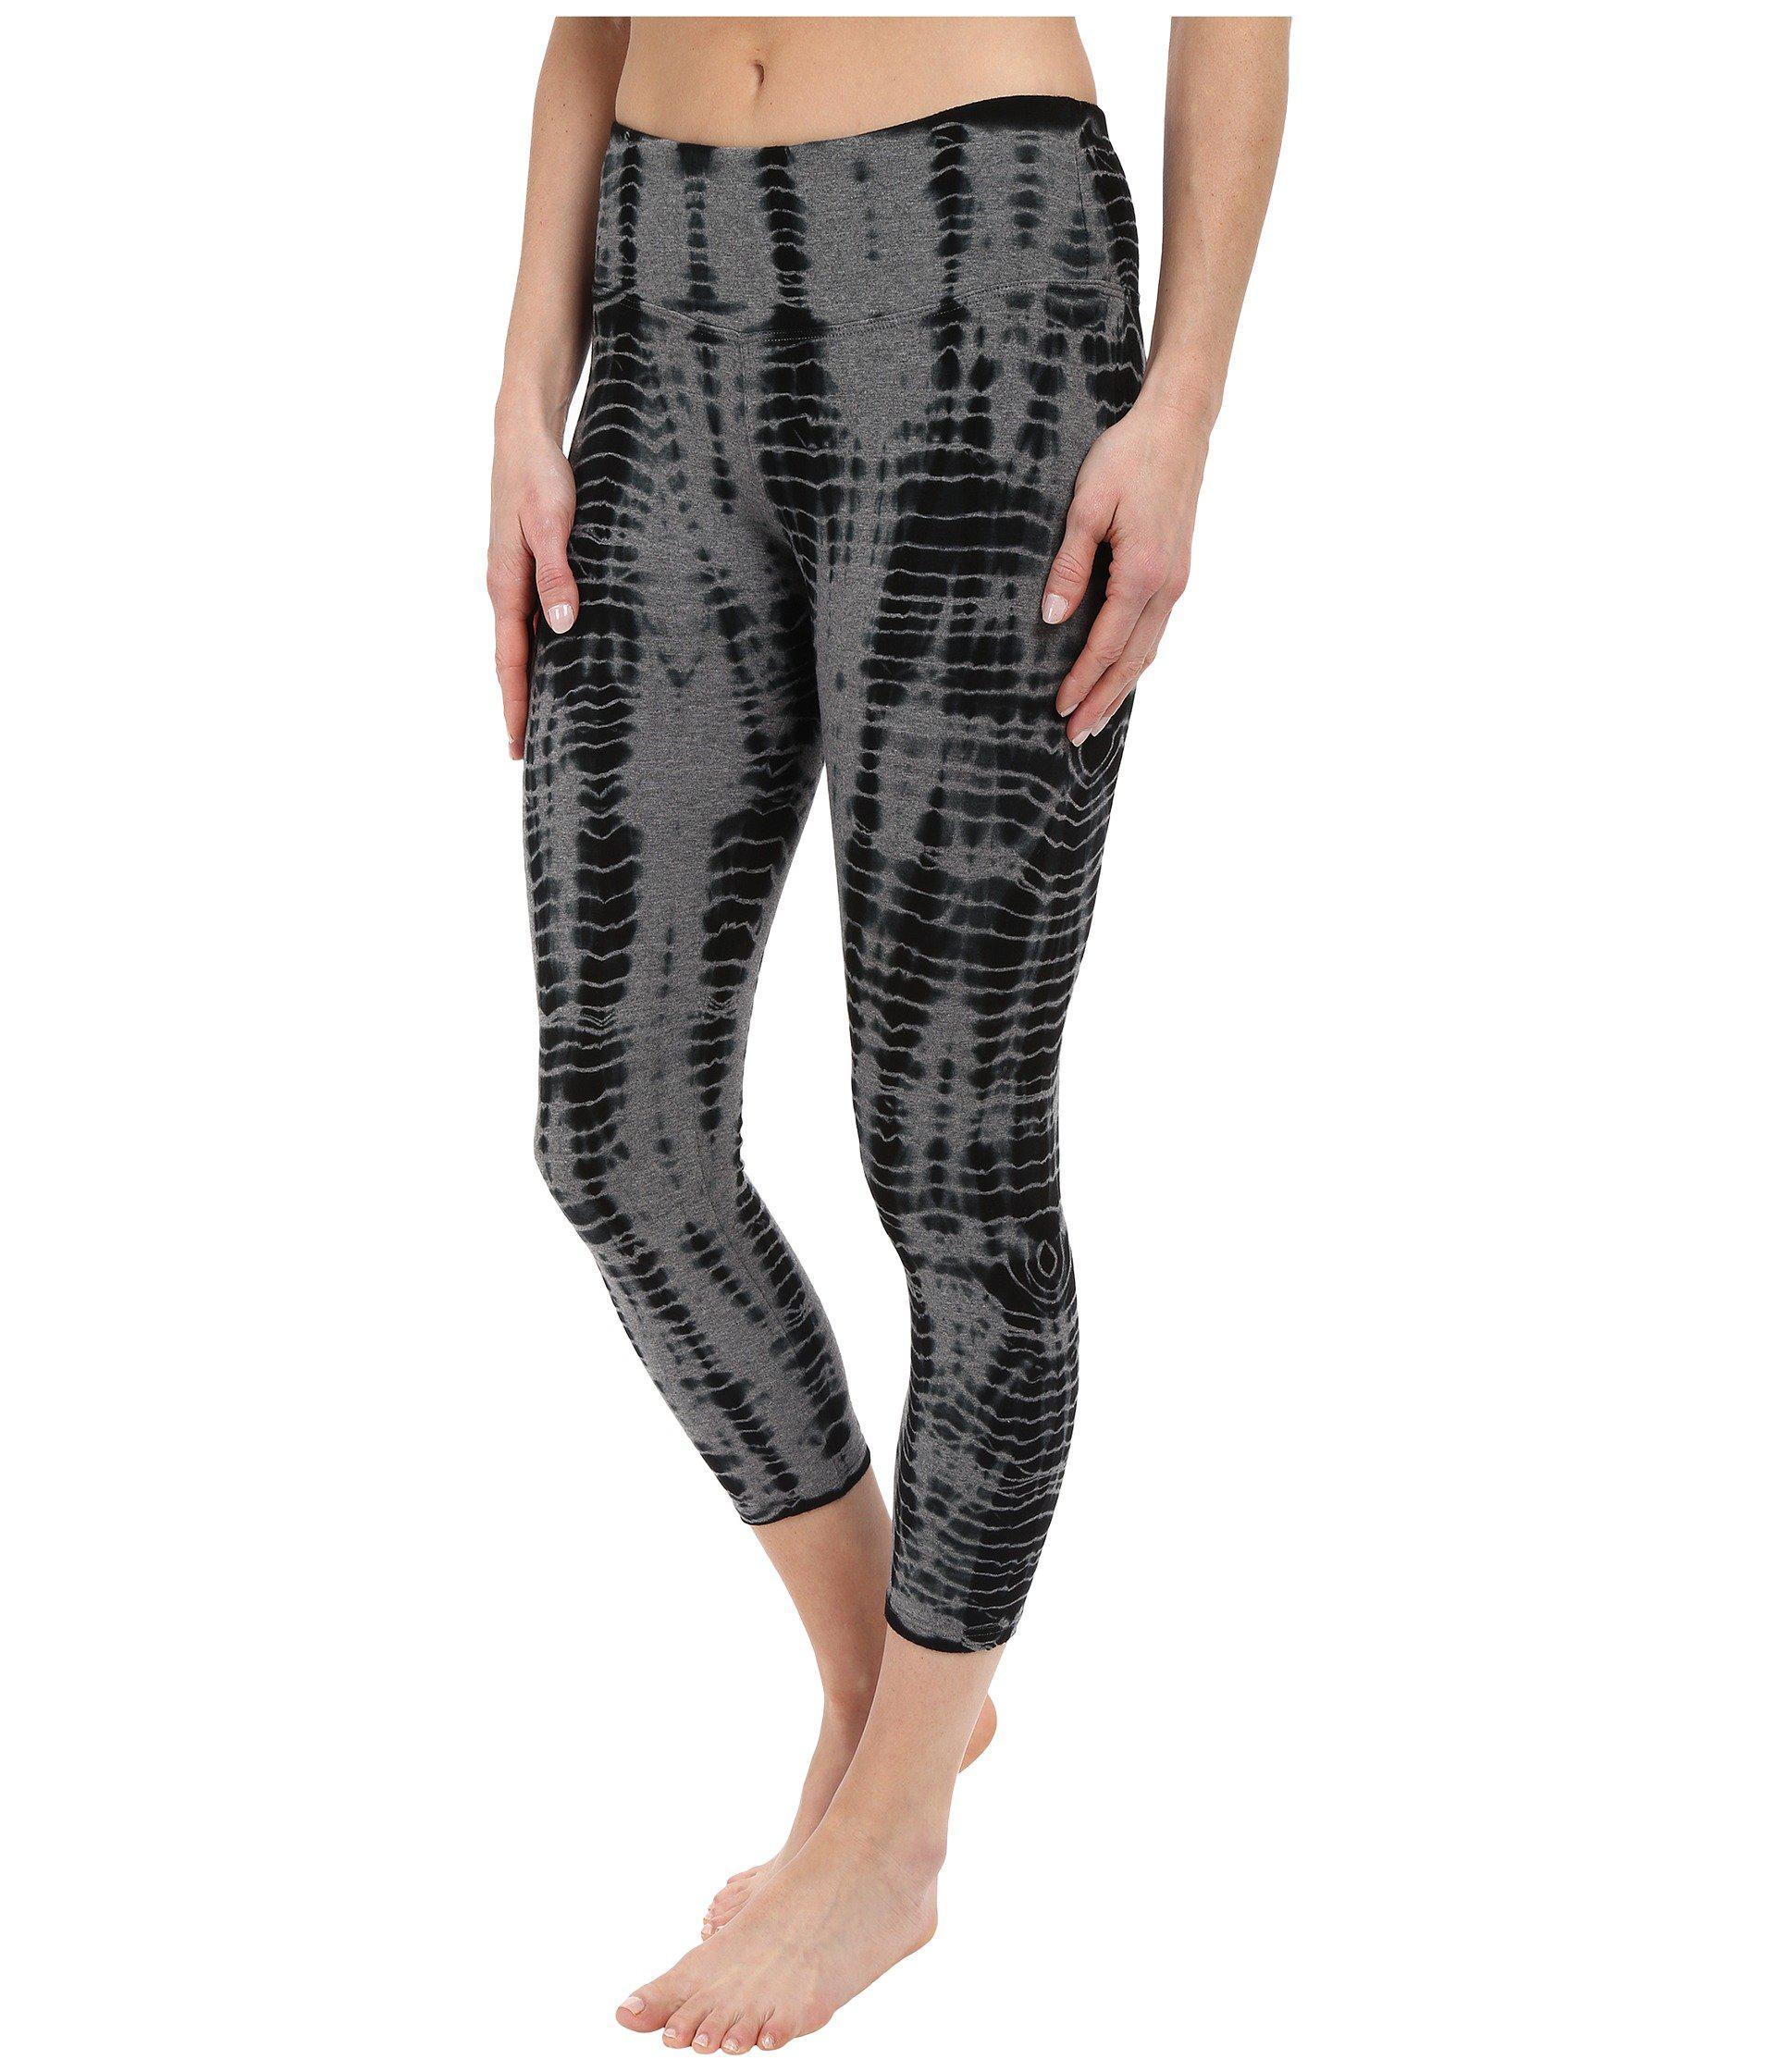 495eb219f2c8e Lyst - Hard Tail Flat Waist Capri Leggings (all Over Lizard 1) Women's  Workout in Black